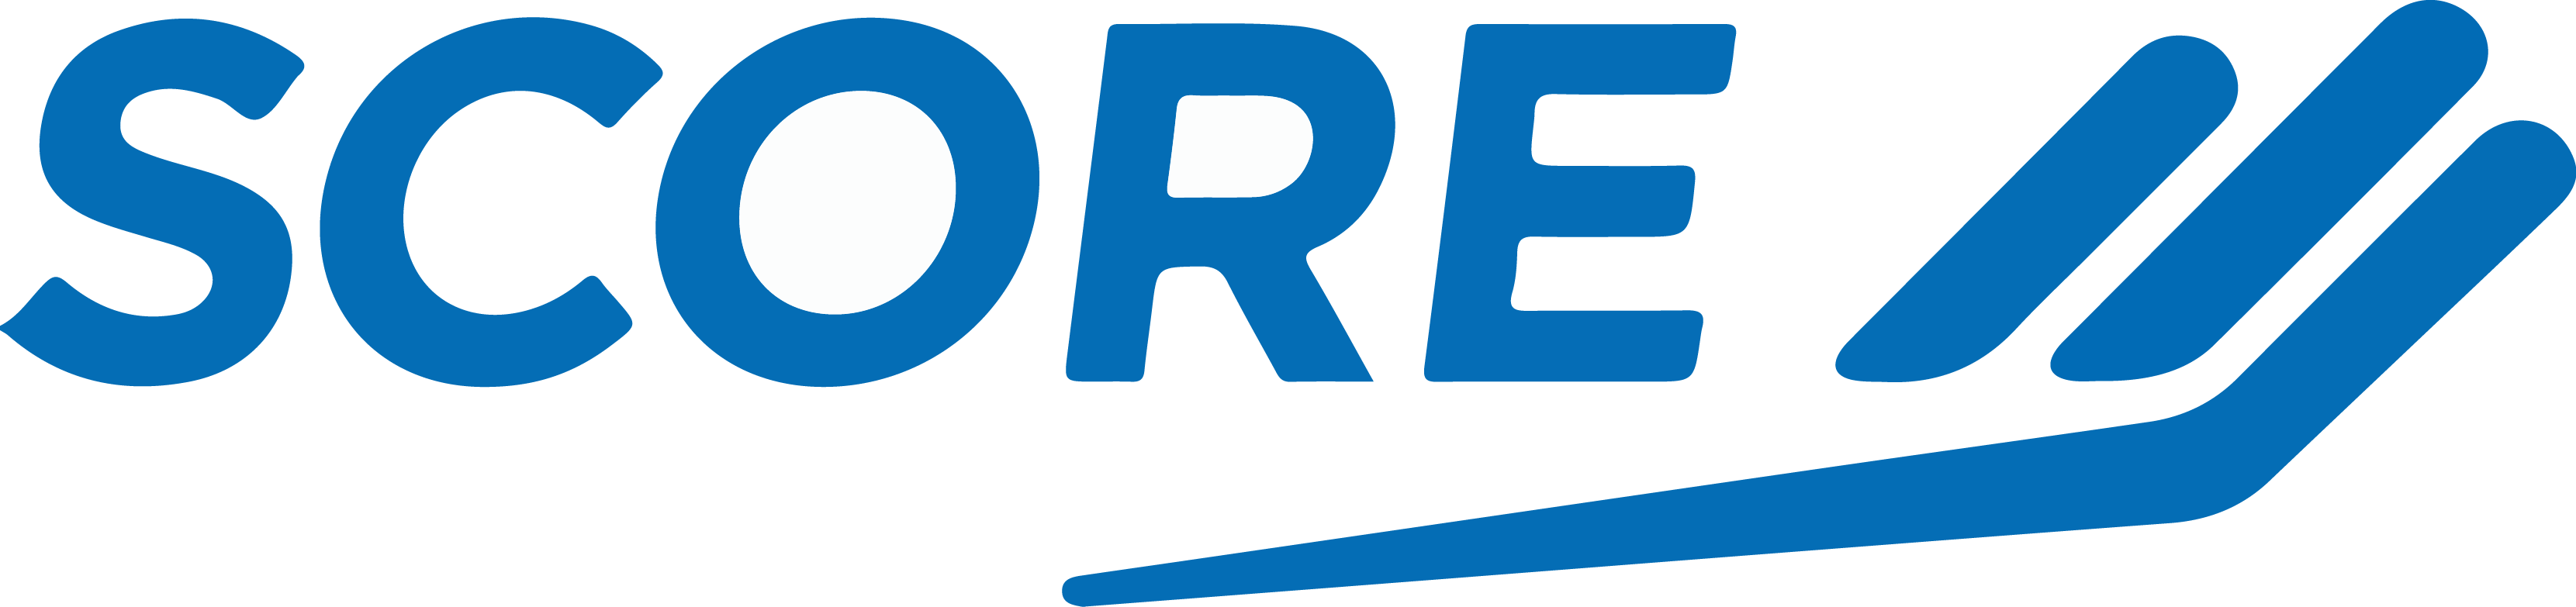 SCORE Association logo